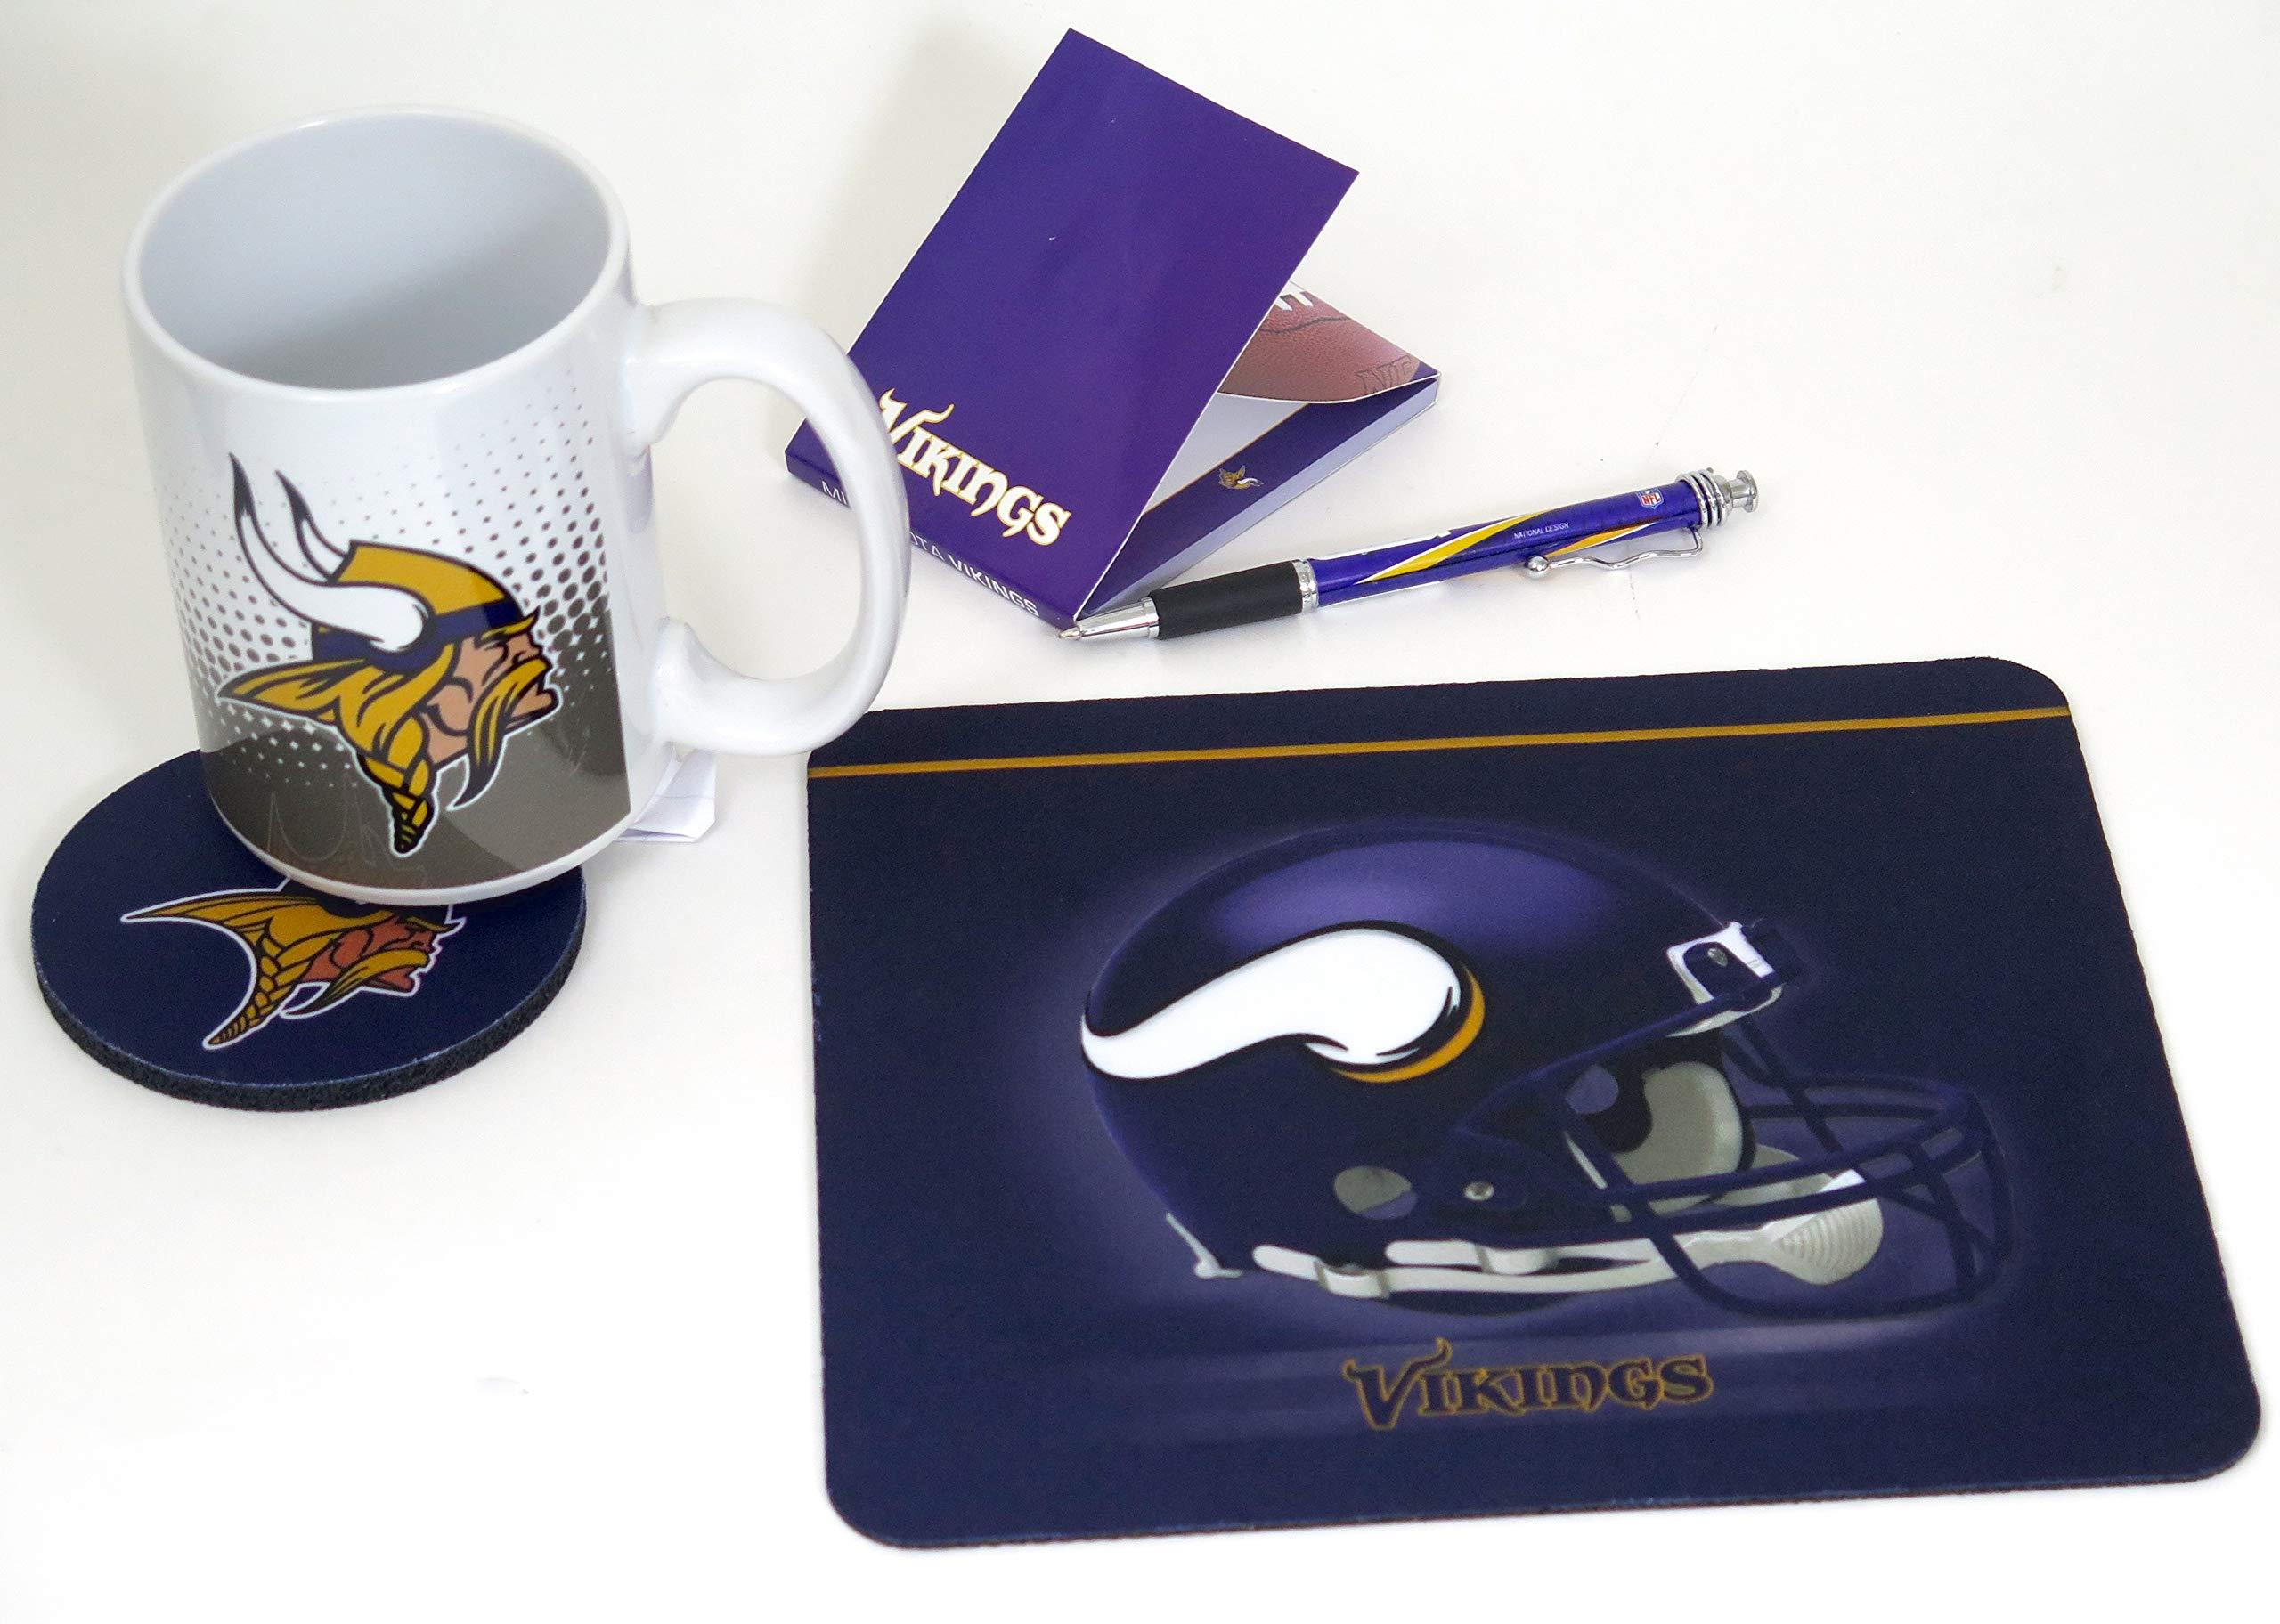 Minnesota Vikings Computer Workstation Set. Includes a Mouse pad, Coaster, Large Coffee Mug, memo pad, and Ballpoint Pen Too.